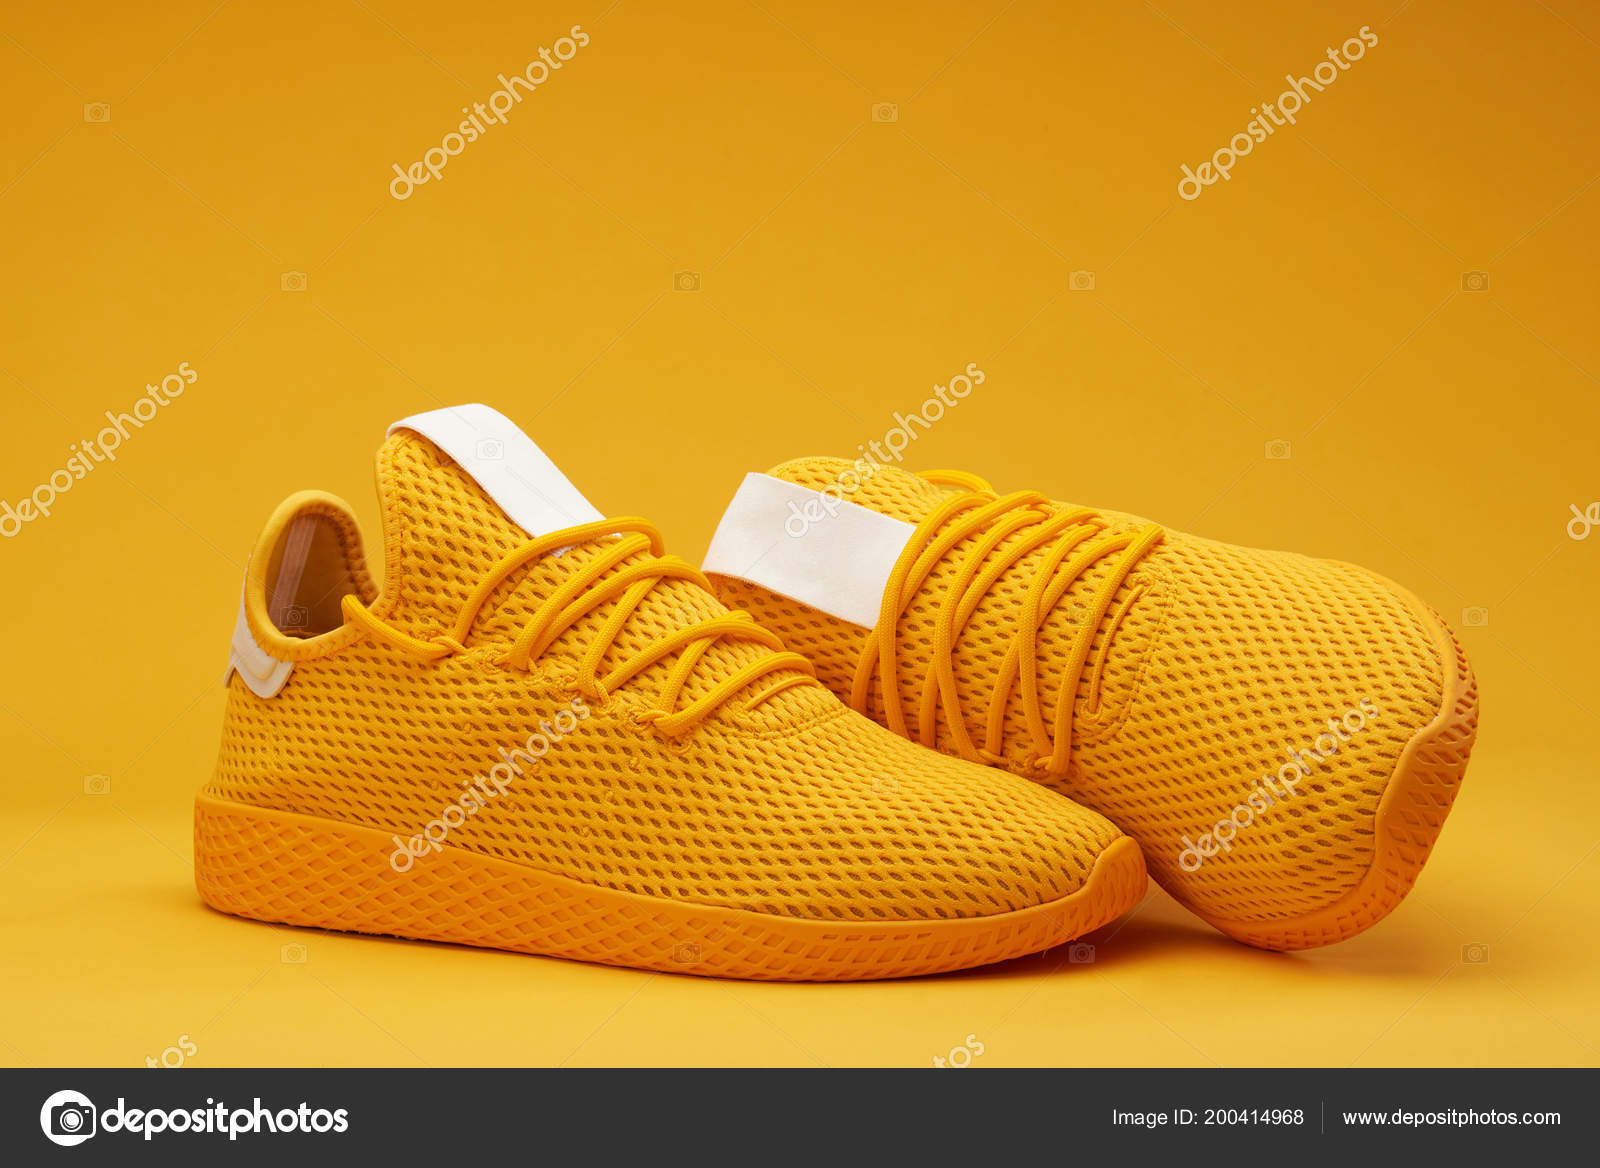 c8785b4804f Κίτρινα παπούτσια τένις — Φωτογραφία Αρχείου © dimarik #200414968